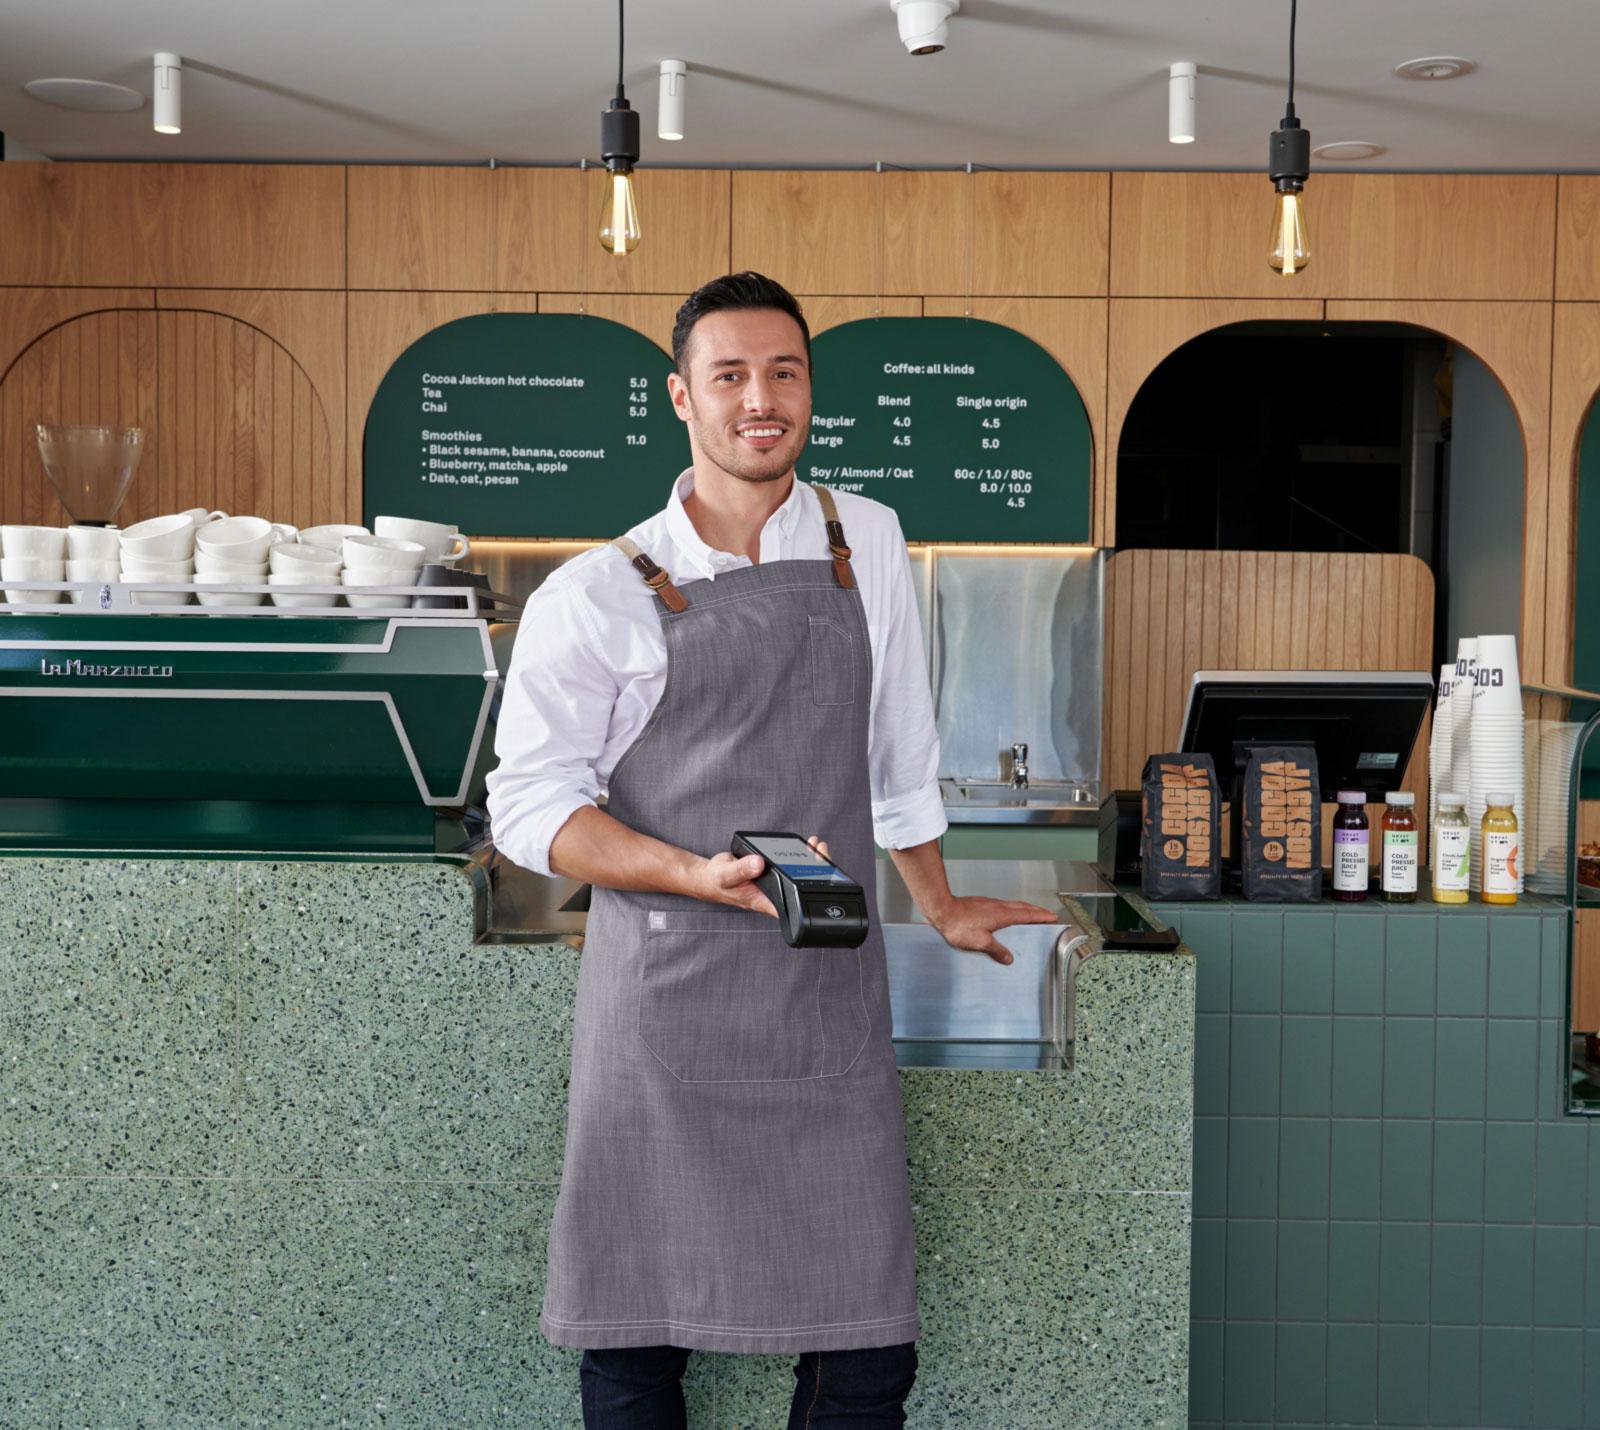 restaurant-owner-holding-black-eftpos-payment-terminal